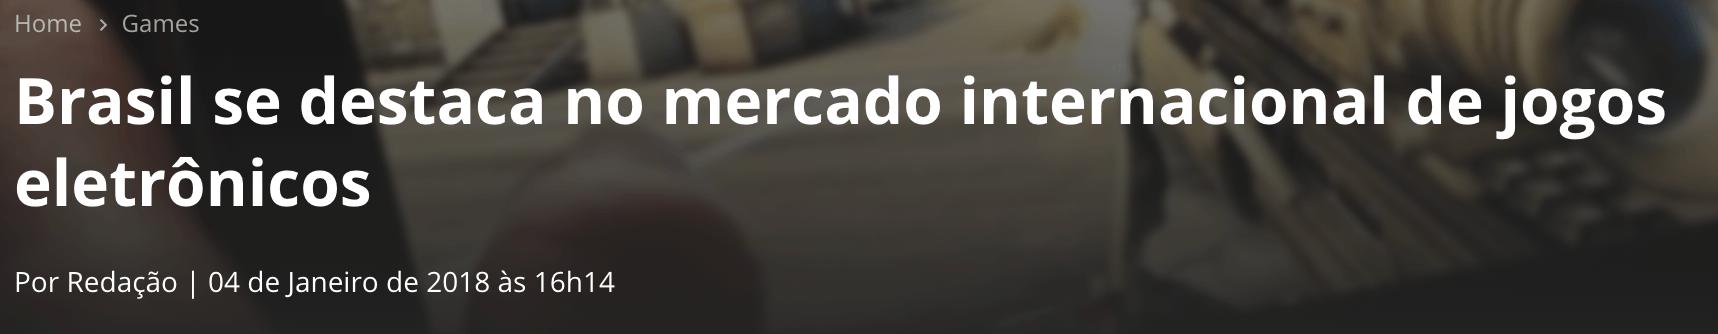 Brasil Destaque no Mercado Interacional de Jogos Eletrônicos